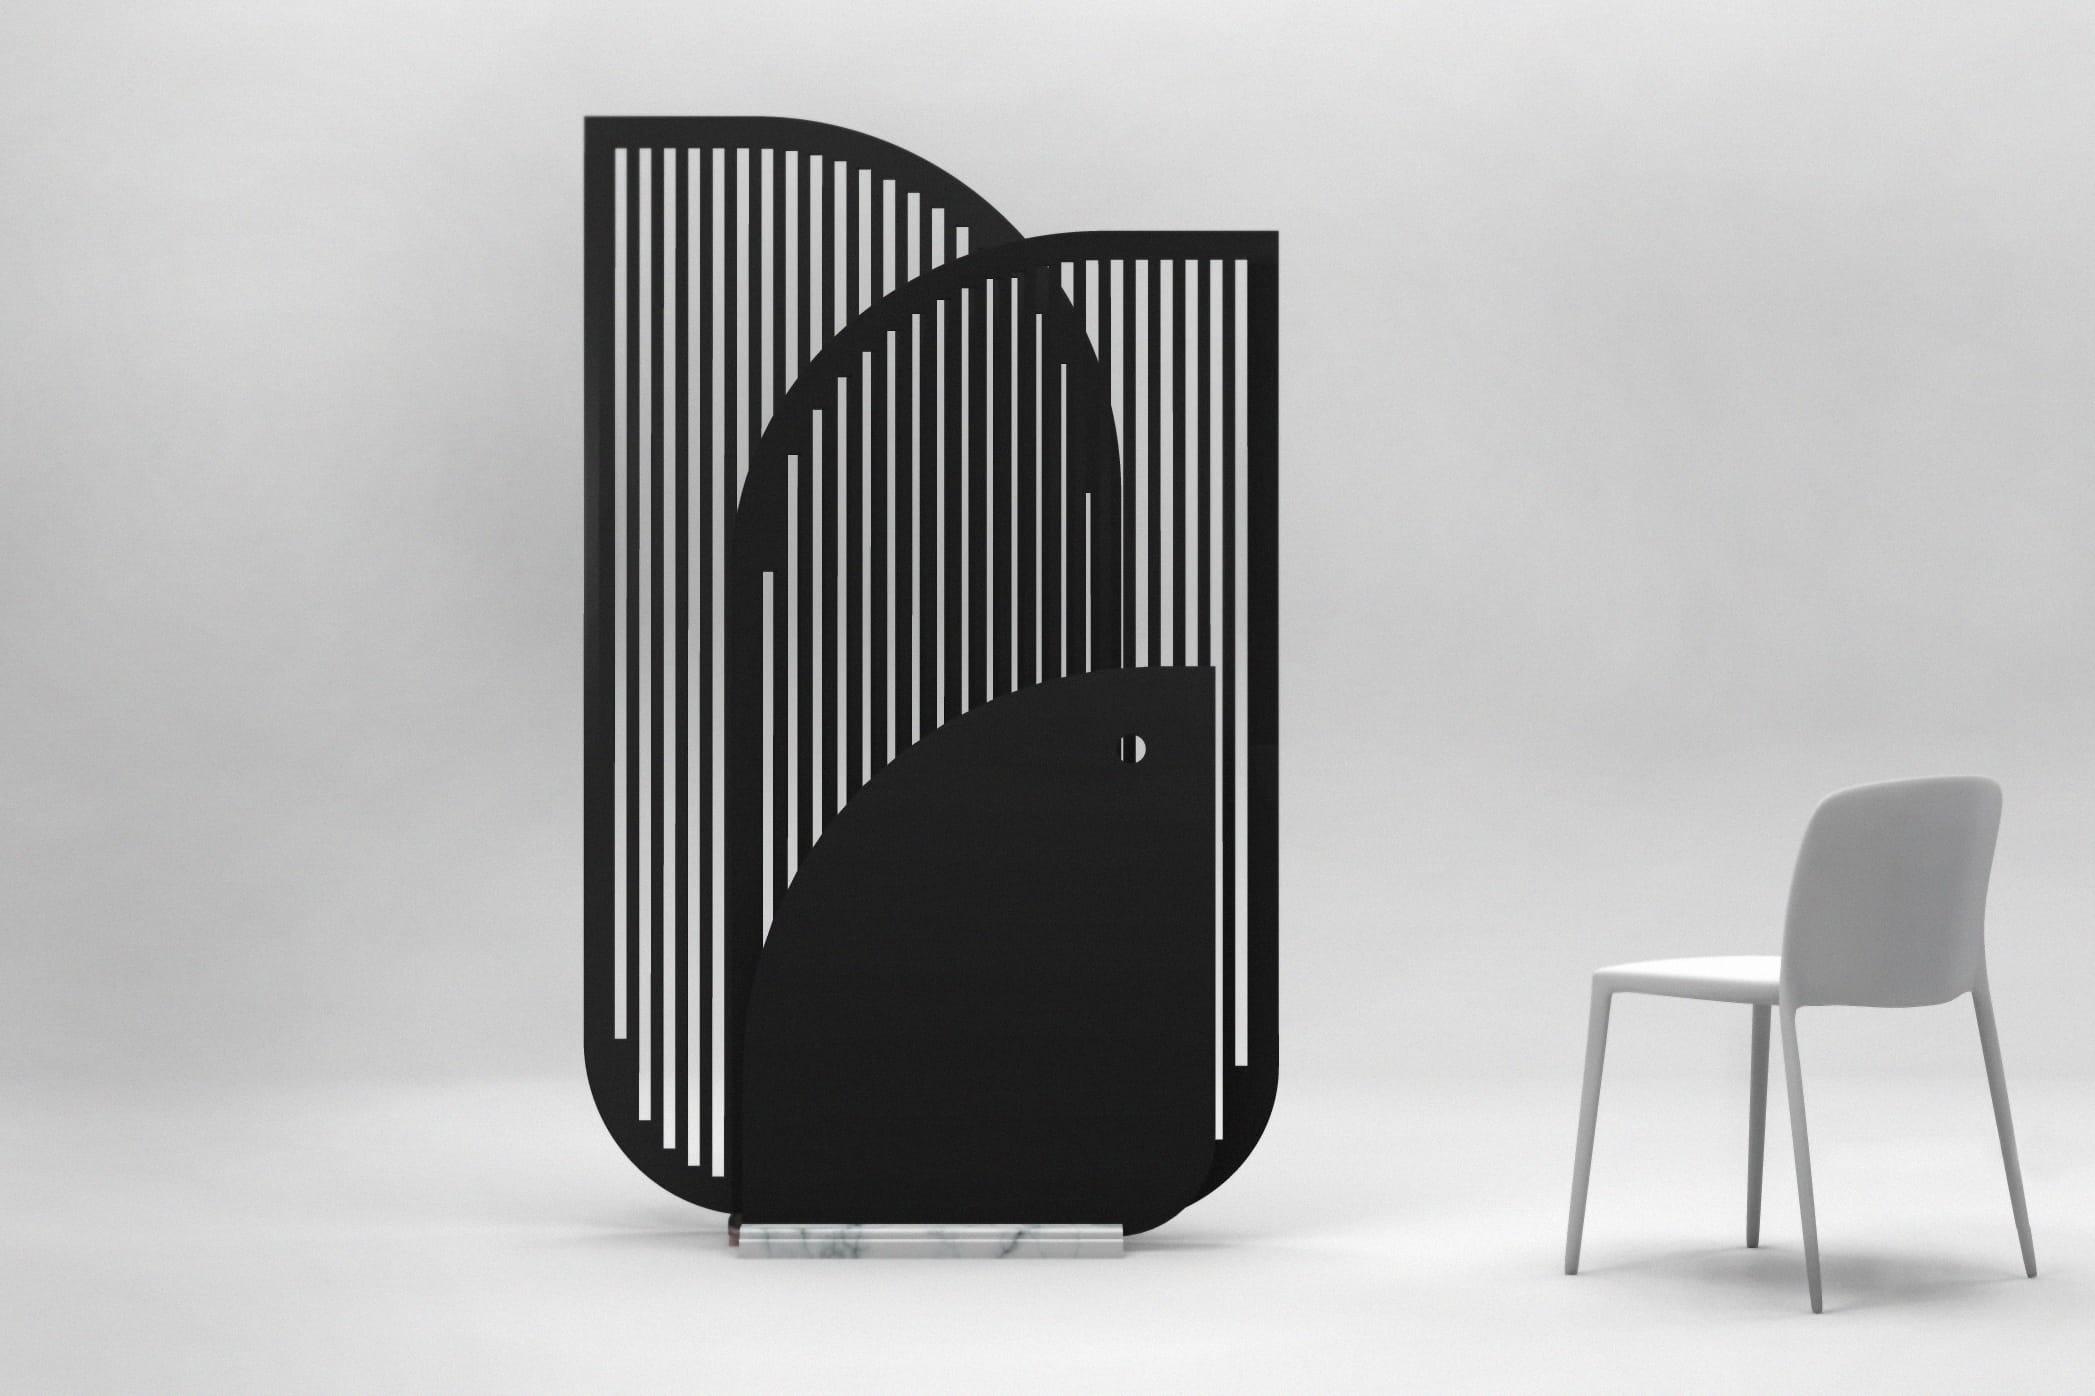 paravent par gilles neveu. Black Bedroom Furniture Sets. Home Design Ideas